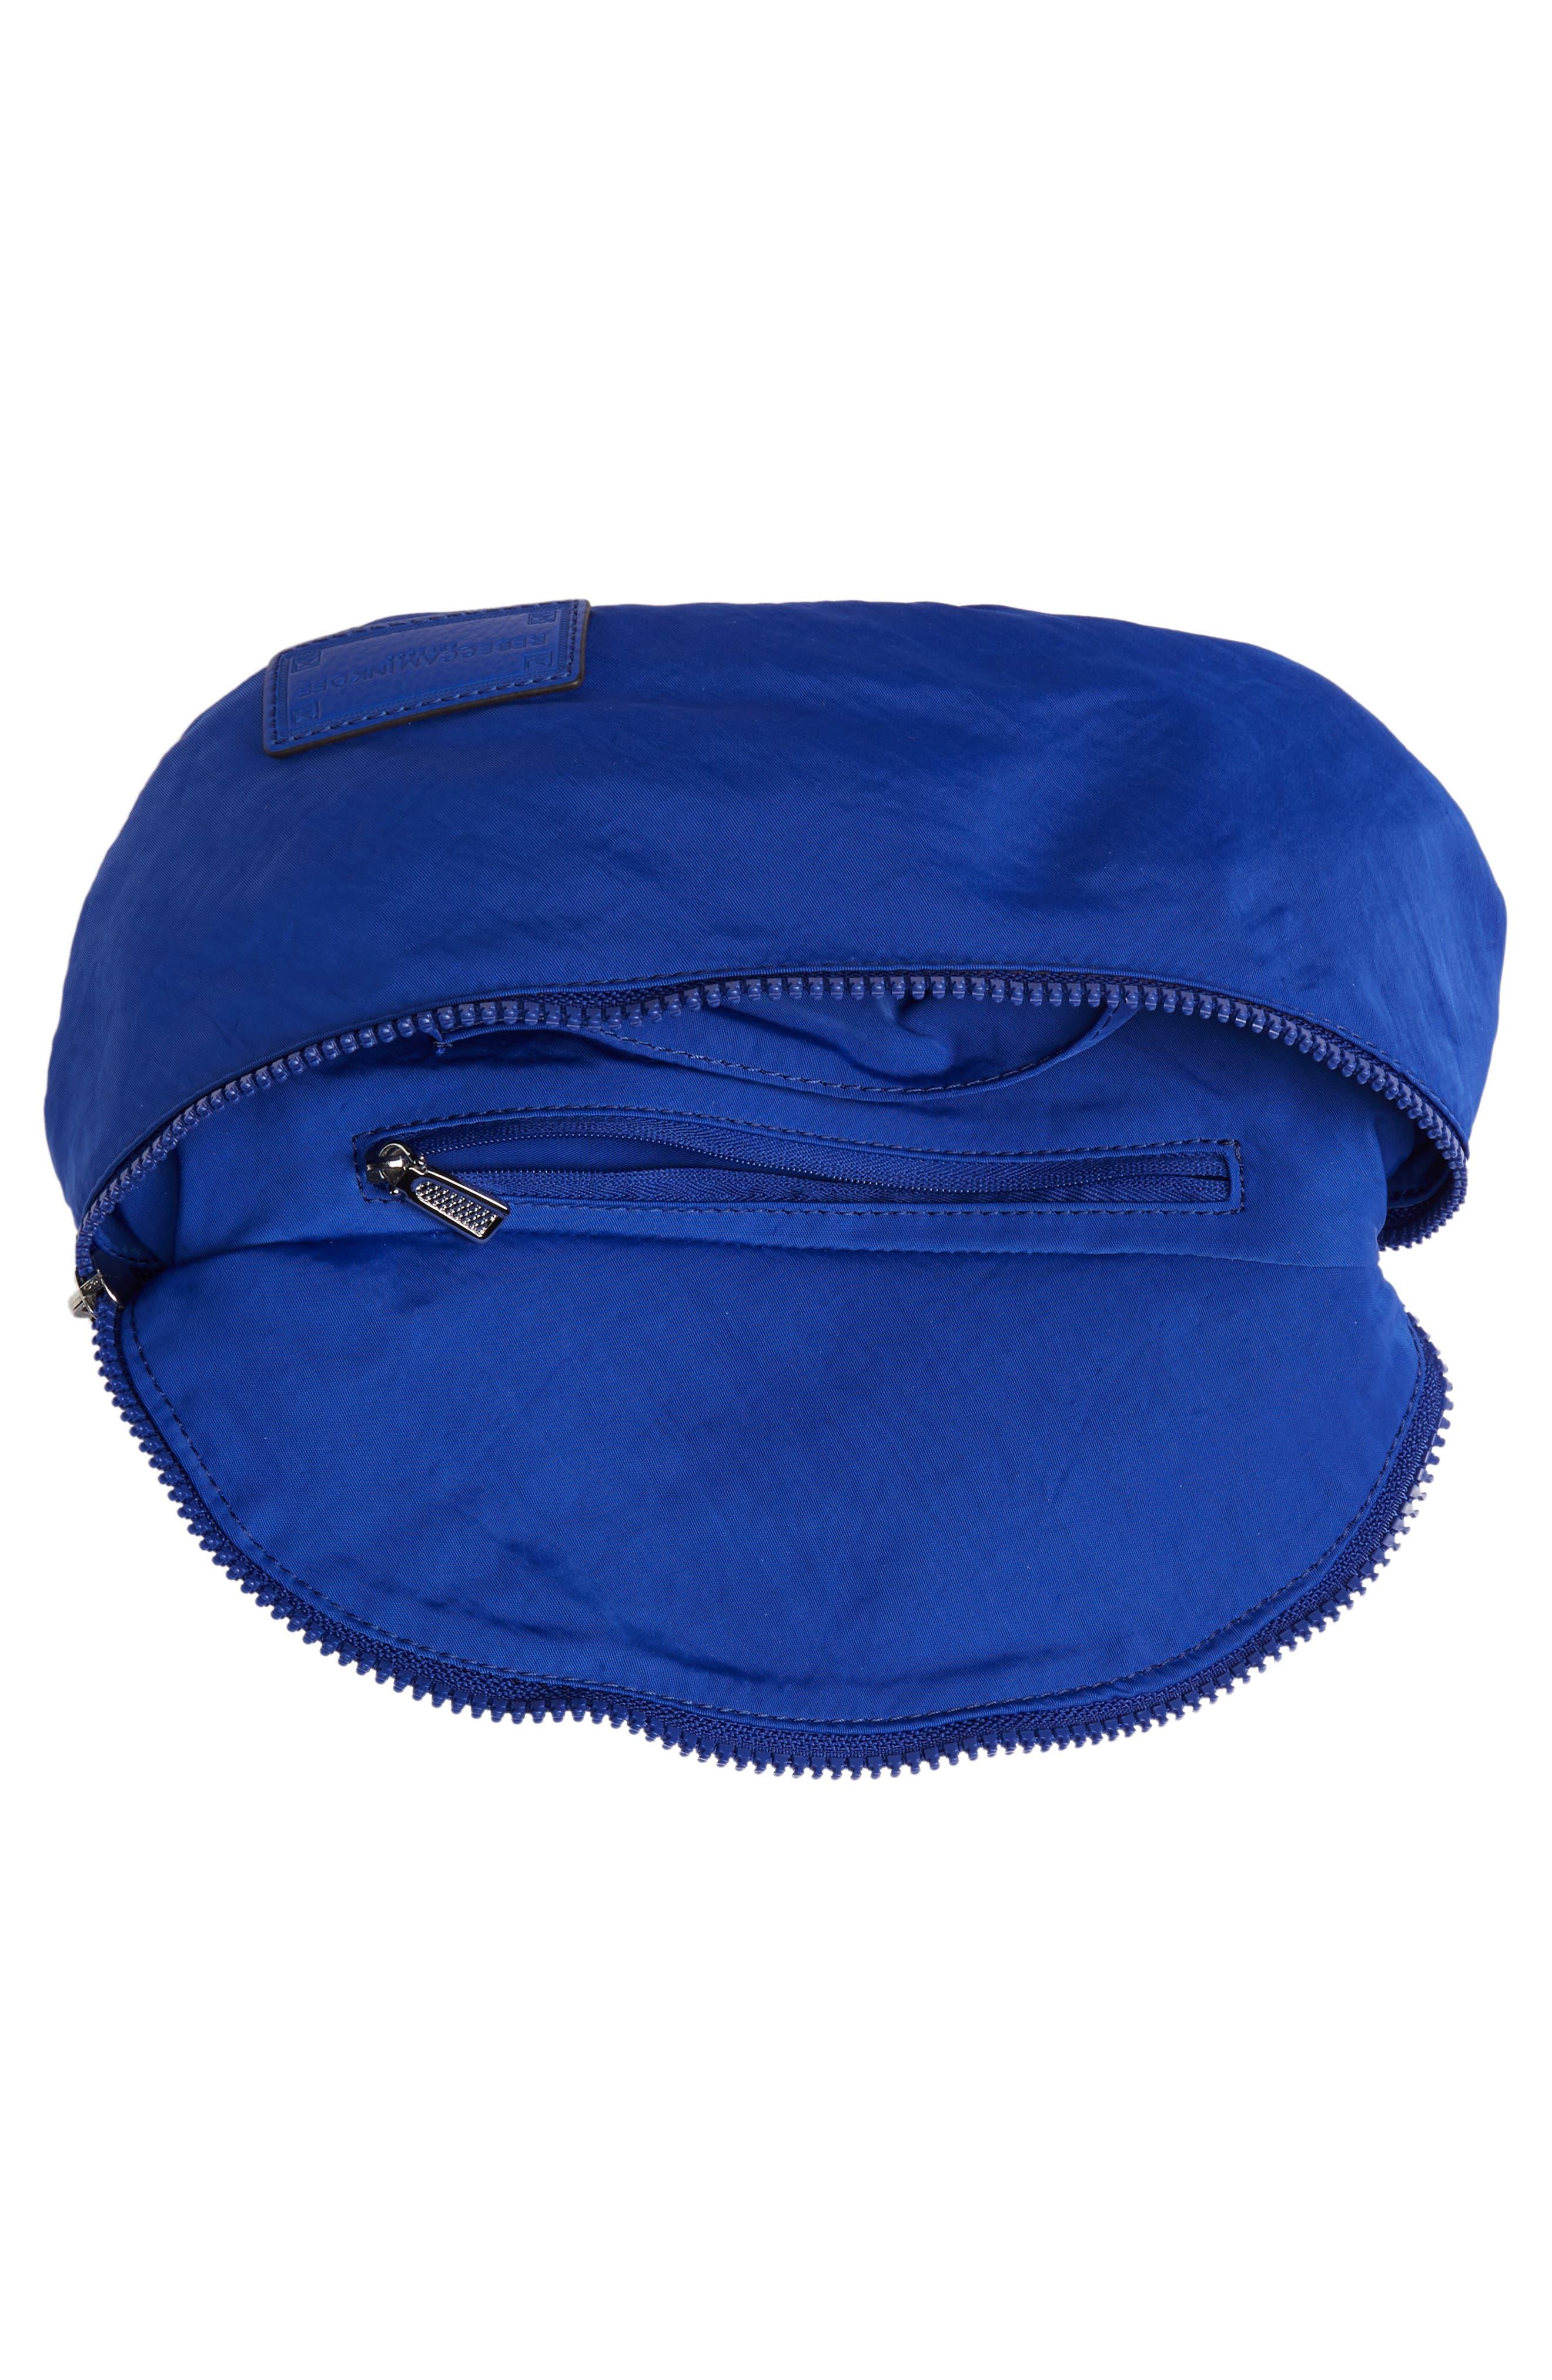 REBECCA MINKOFF, Nylon Belt Bag, Alternate thumbnail 6, color, BRIGHT BLUE